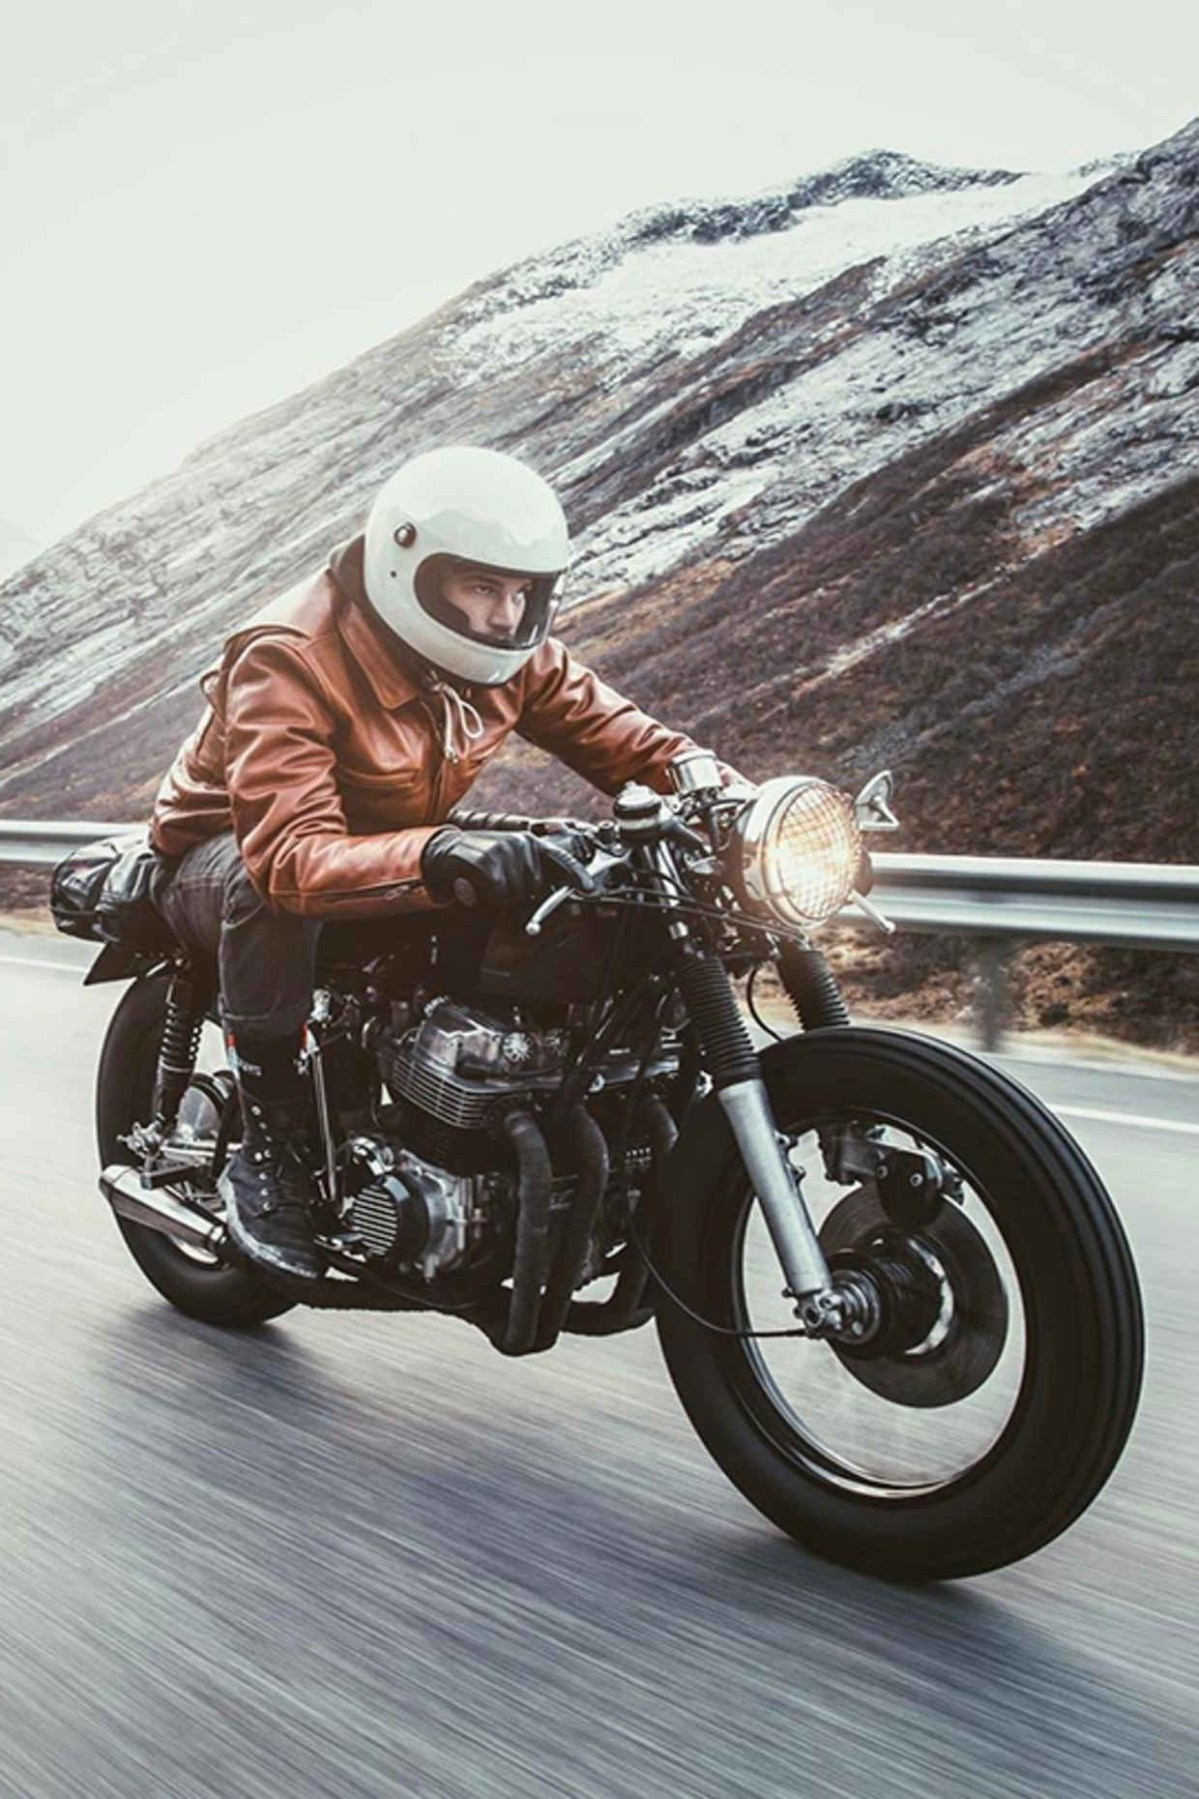 random inspiration 273 bike motorcycle outfit harley